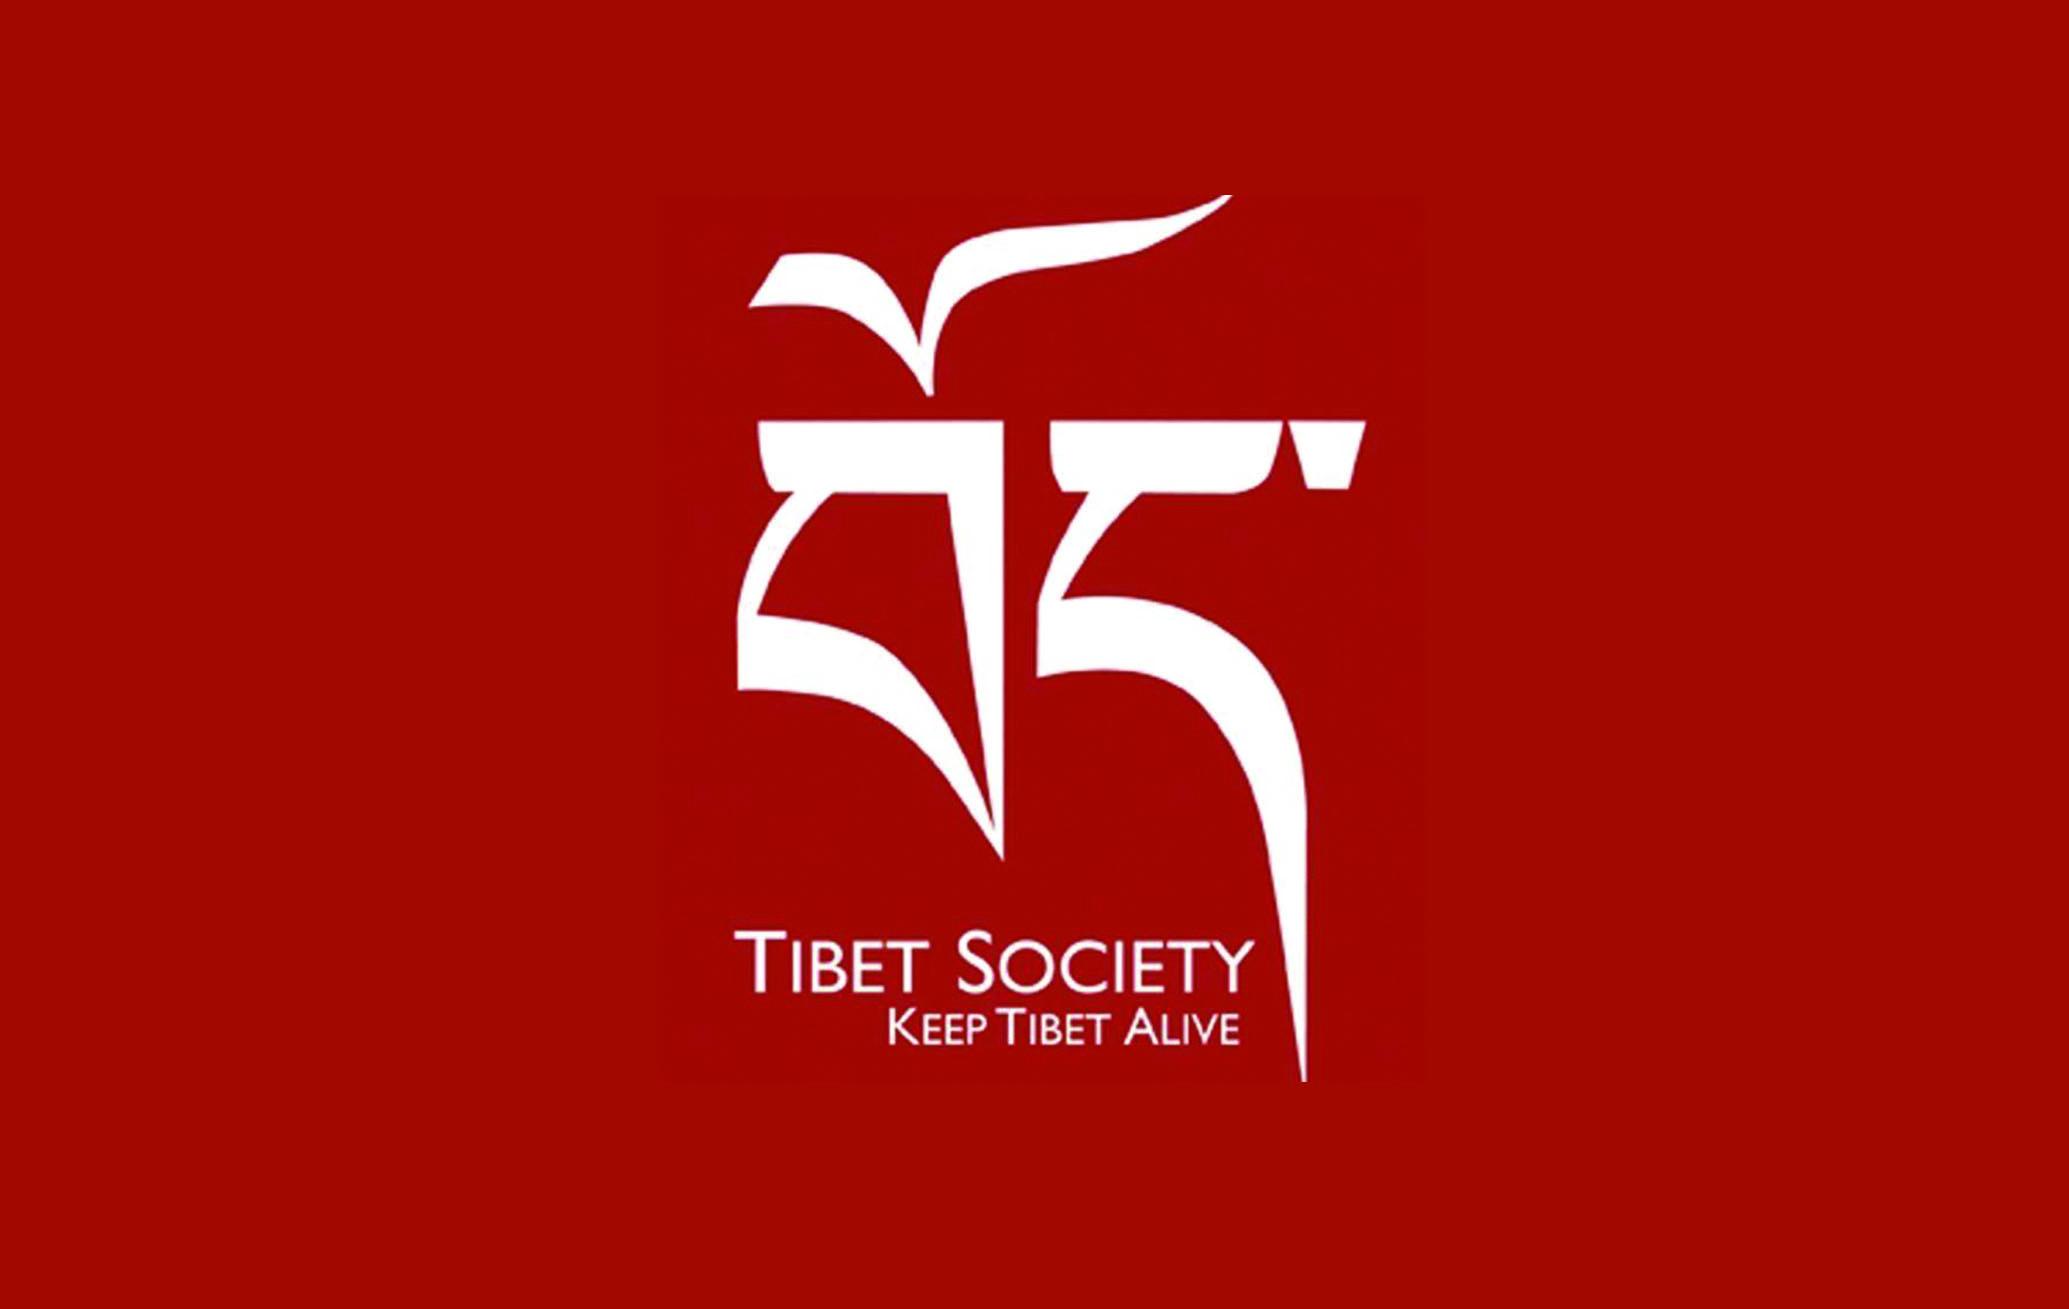 Tibet Society Logo